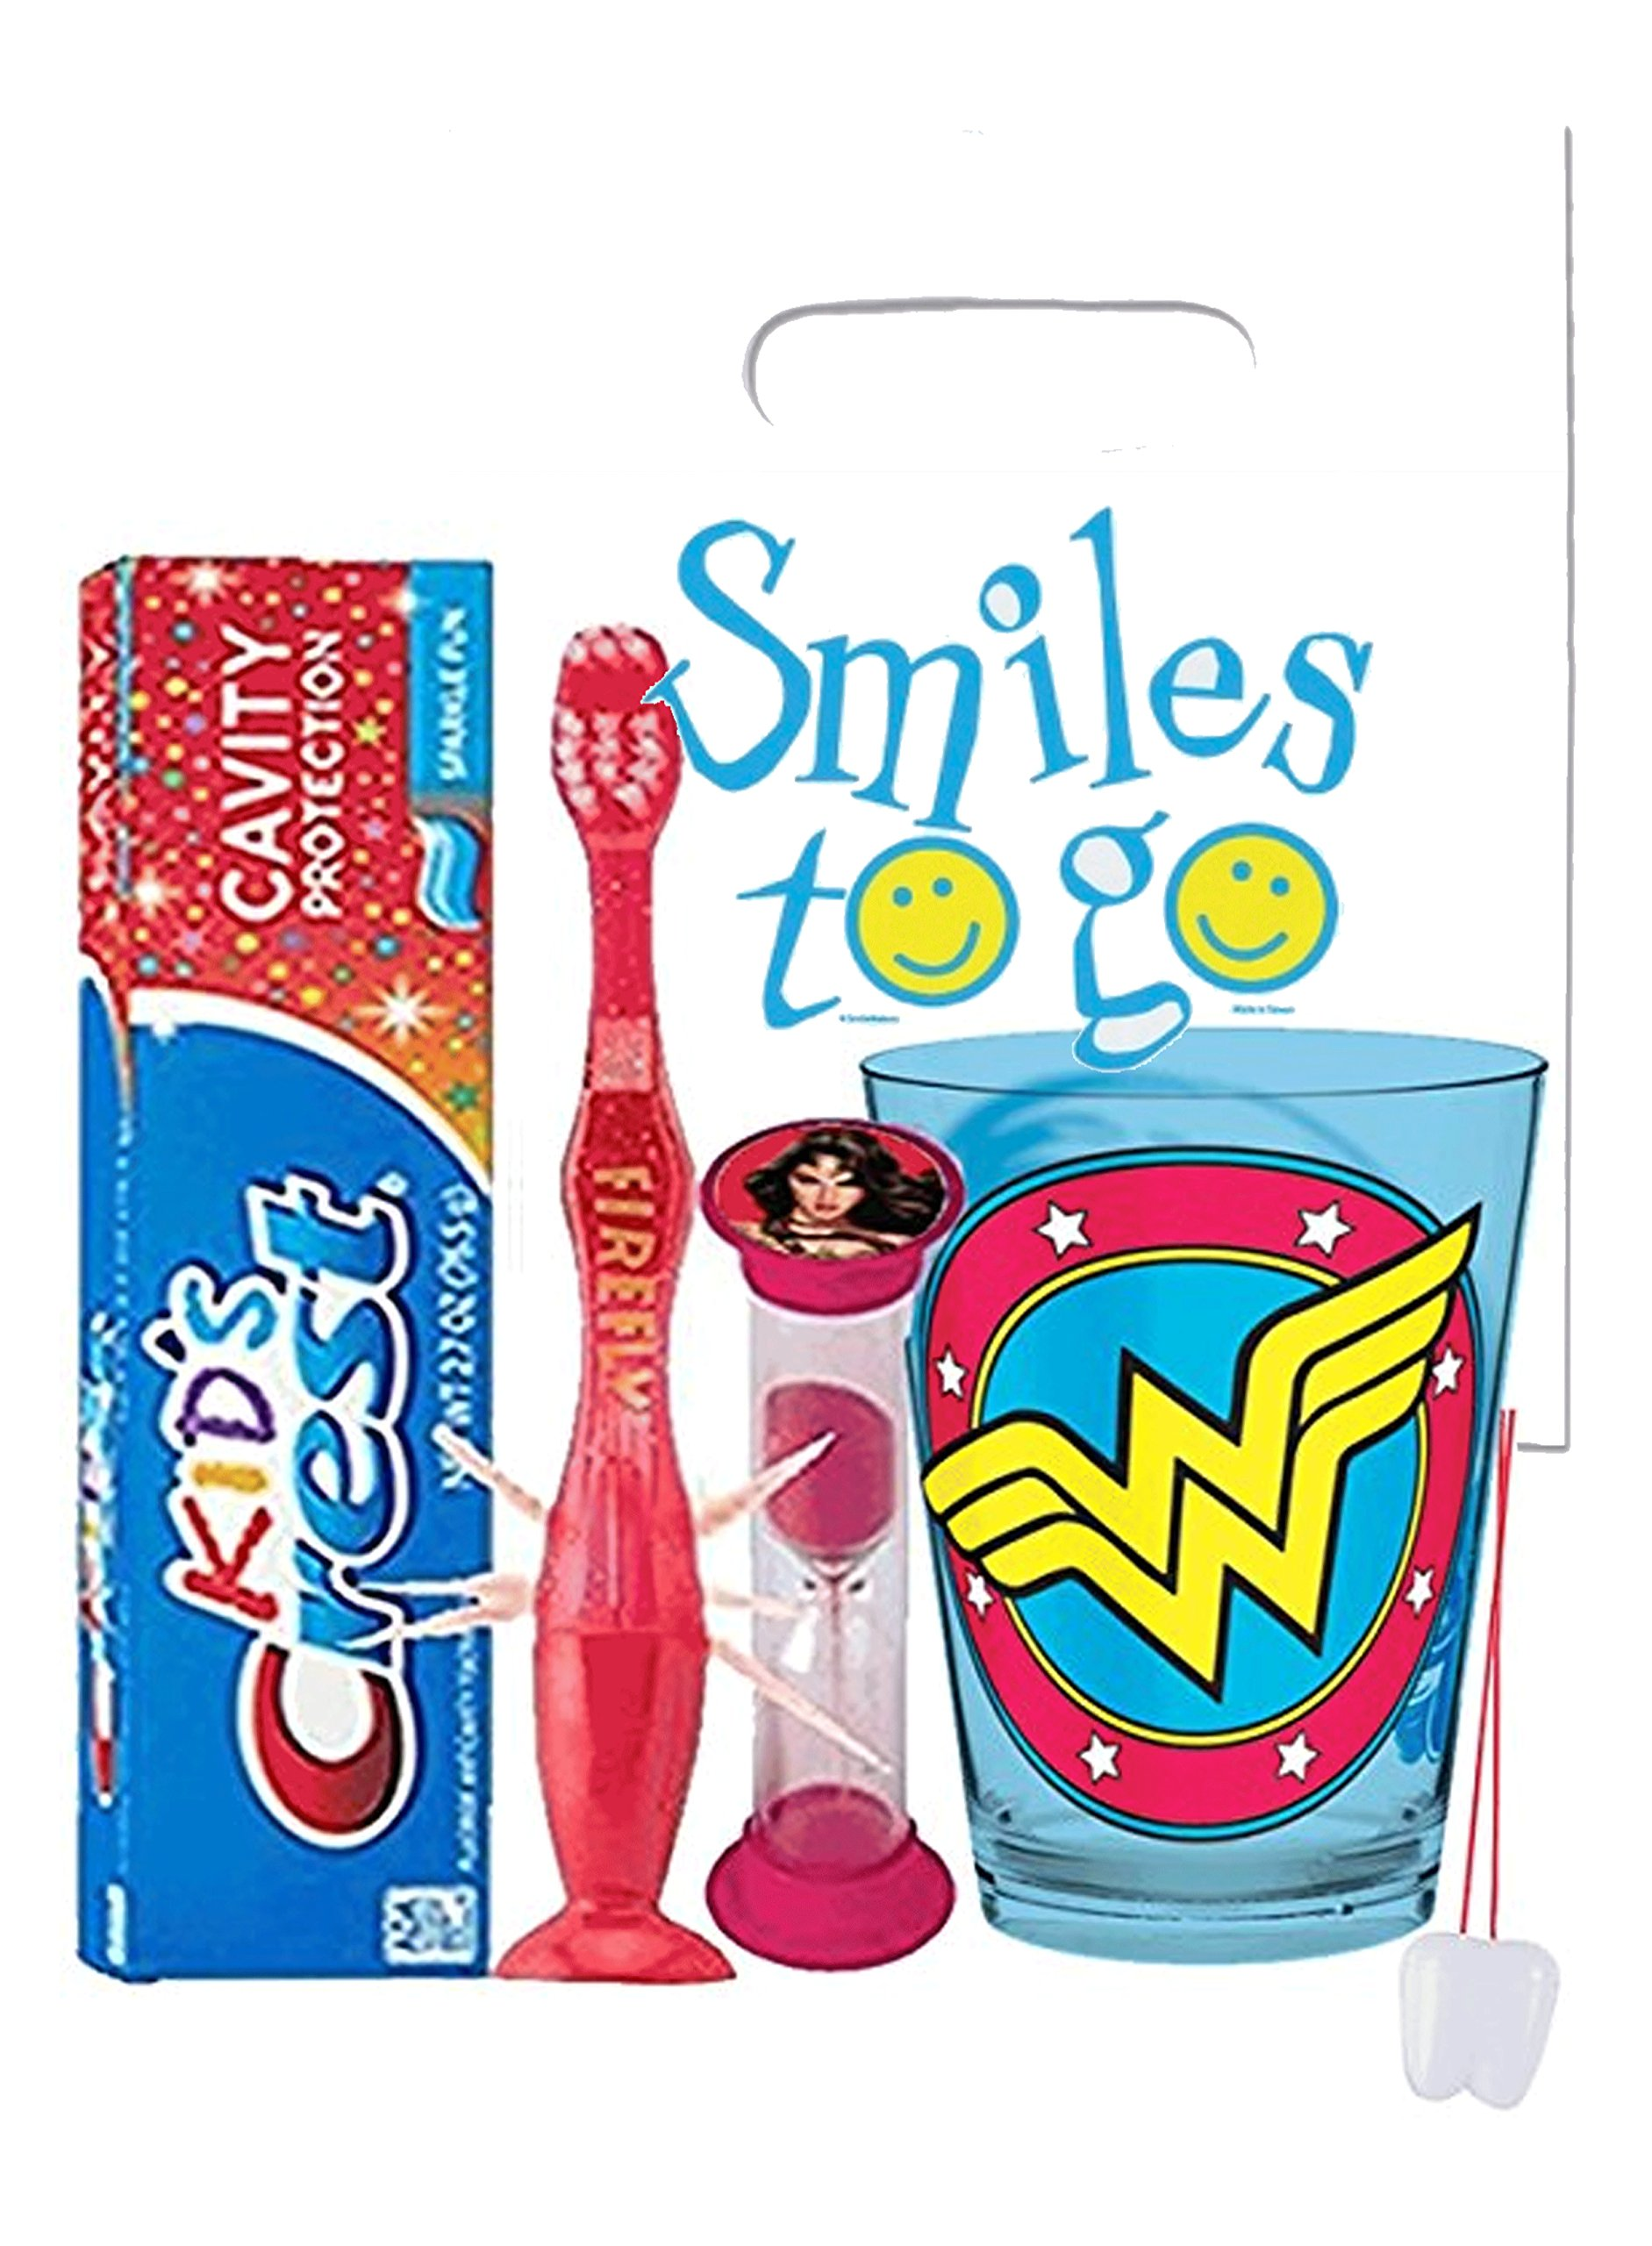 DC Comics Wonder Woman Inspired 4pc Bright Smile Oral Hygiene Bundle! Light Up Toothbrush, Toothpaste, Brushing Timer & Mouthwash Rise Cup! Plus Dental Gift Bag &Remember to Brush Visual Aid!